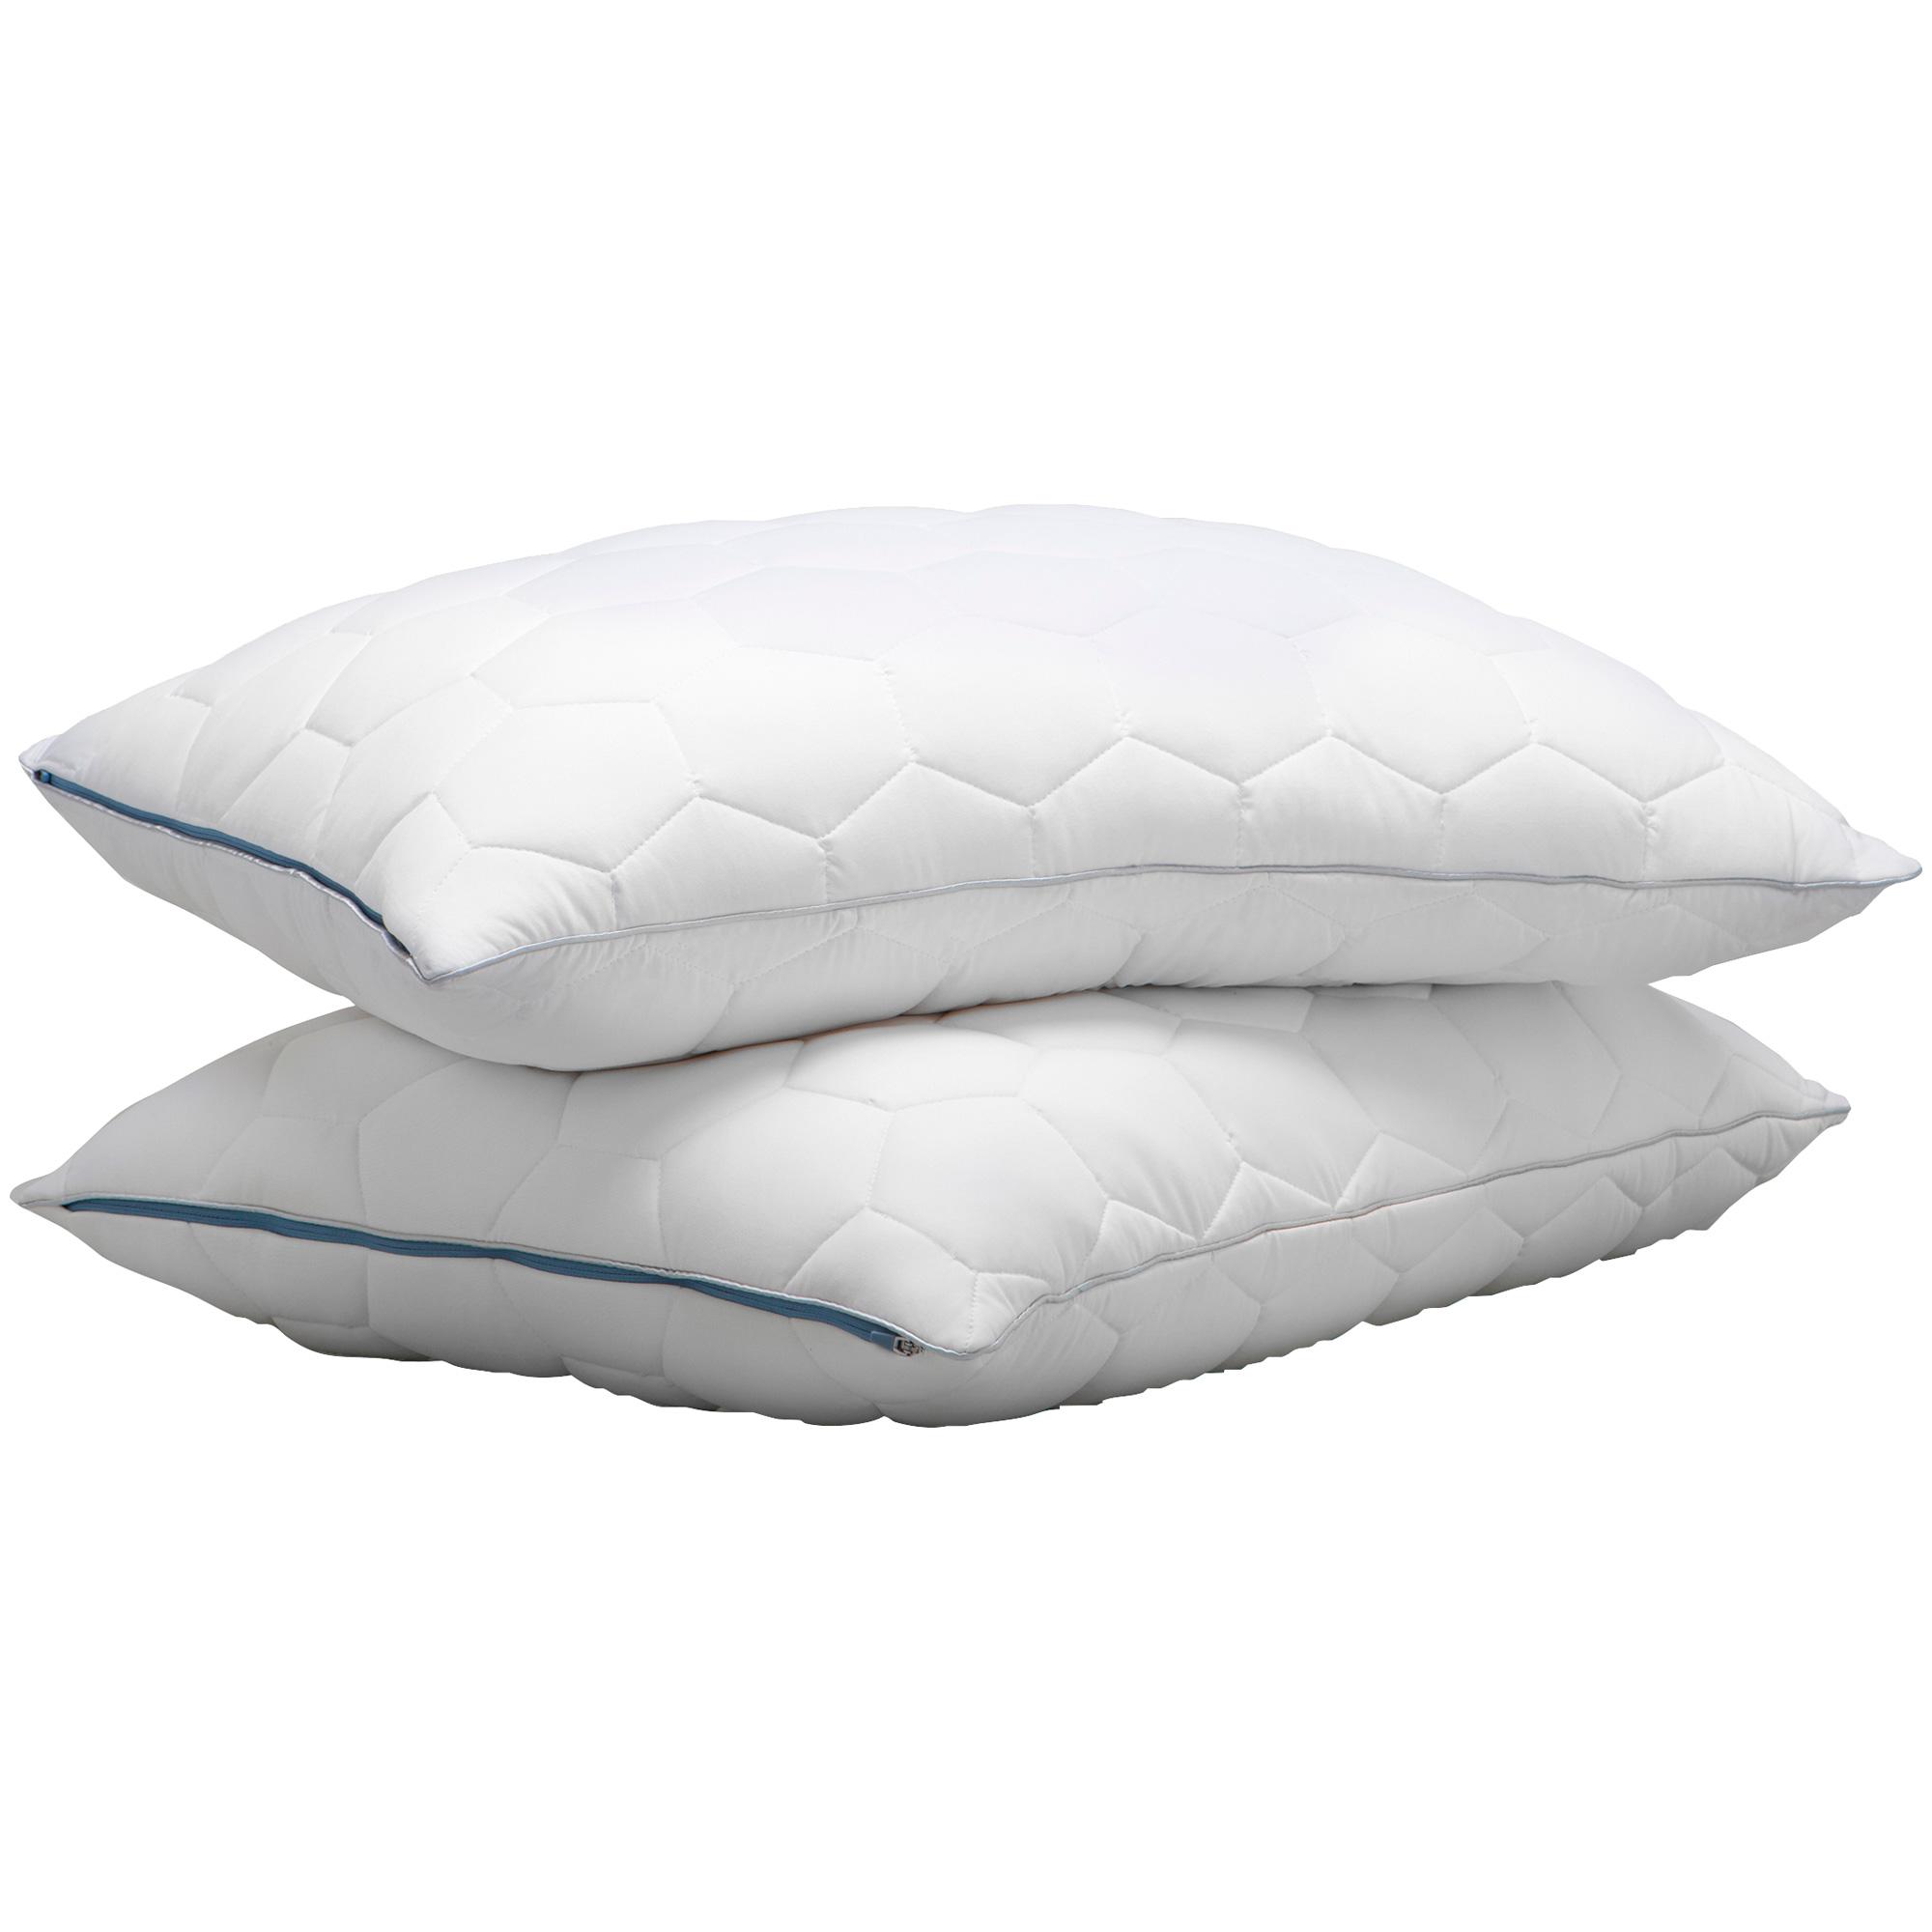 Sheex Inc. | SHEEX Aero Fit Bright White Queen Back Sleeper Pillow